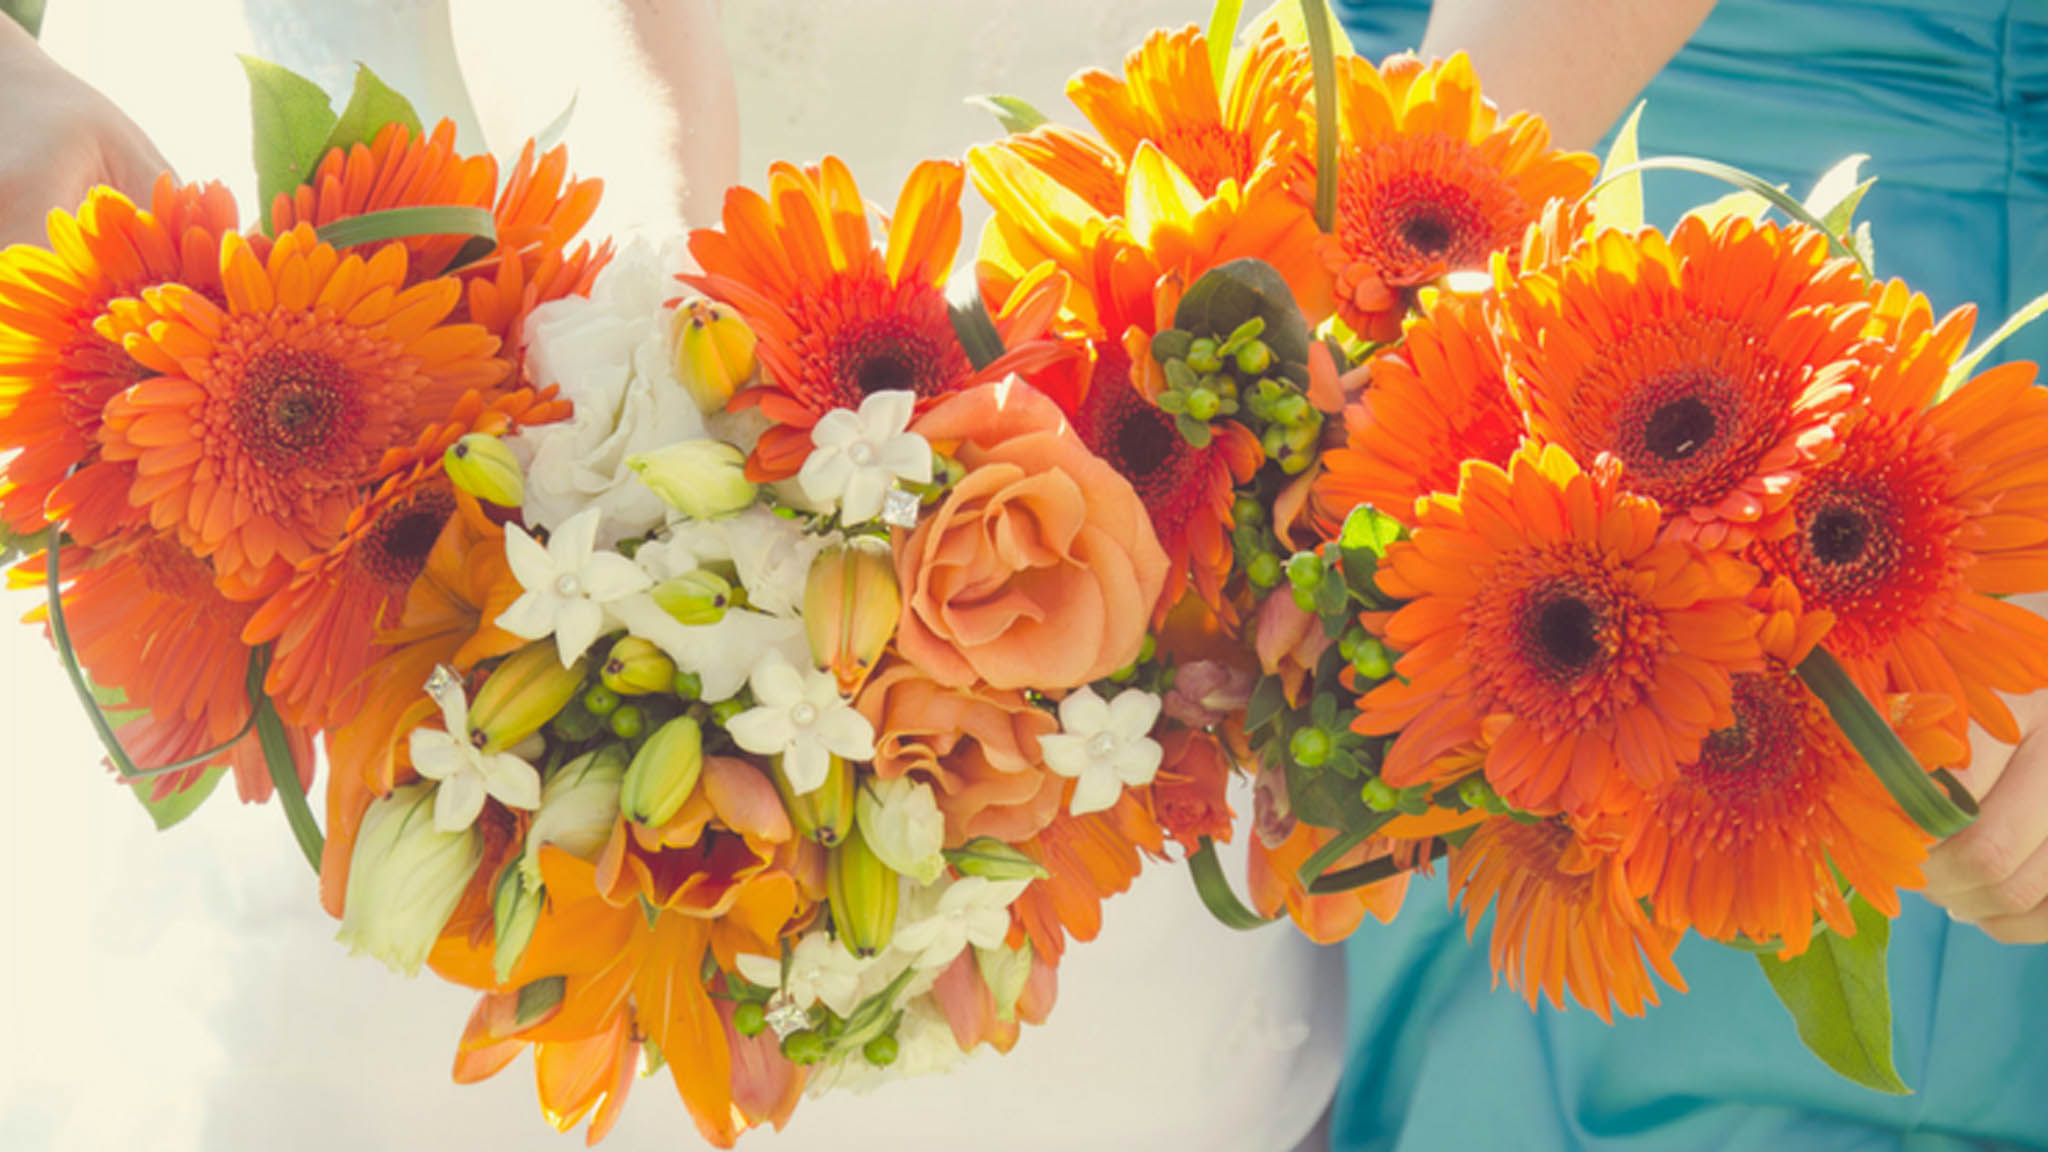 albuquerque wedding florist reviews rio rancho websites. Black Bedroom Furniture Sets. Home Design Ideas